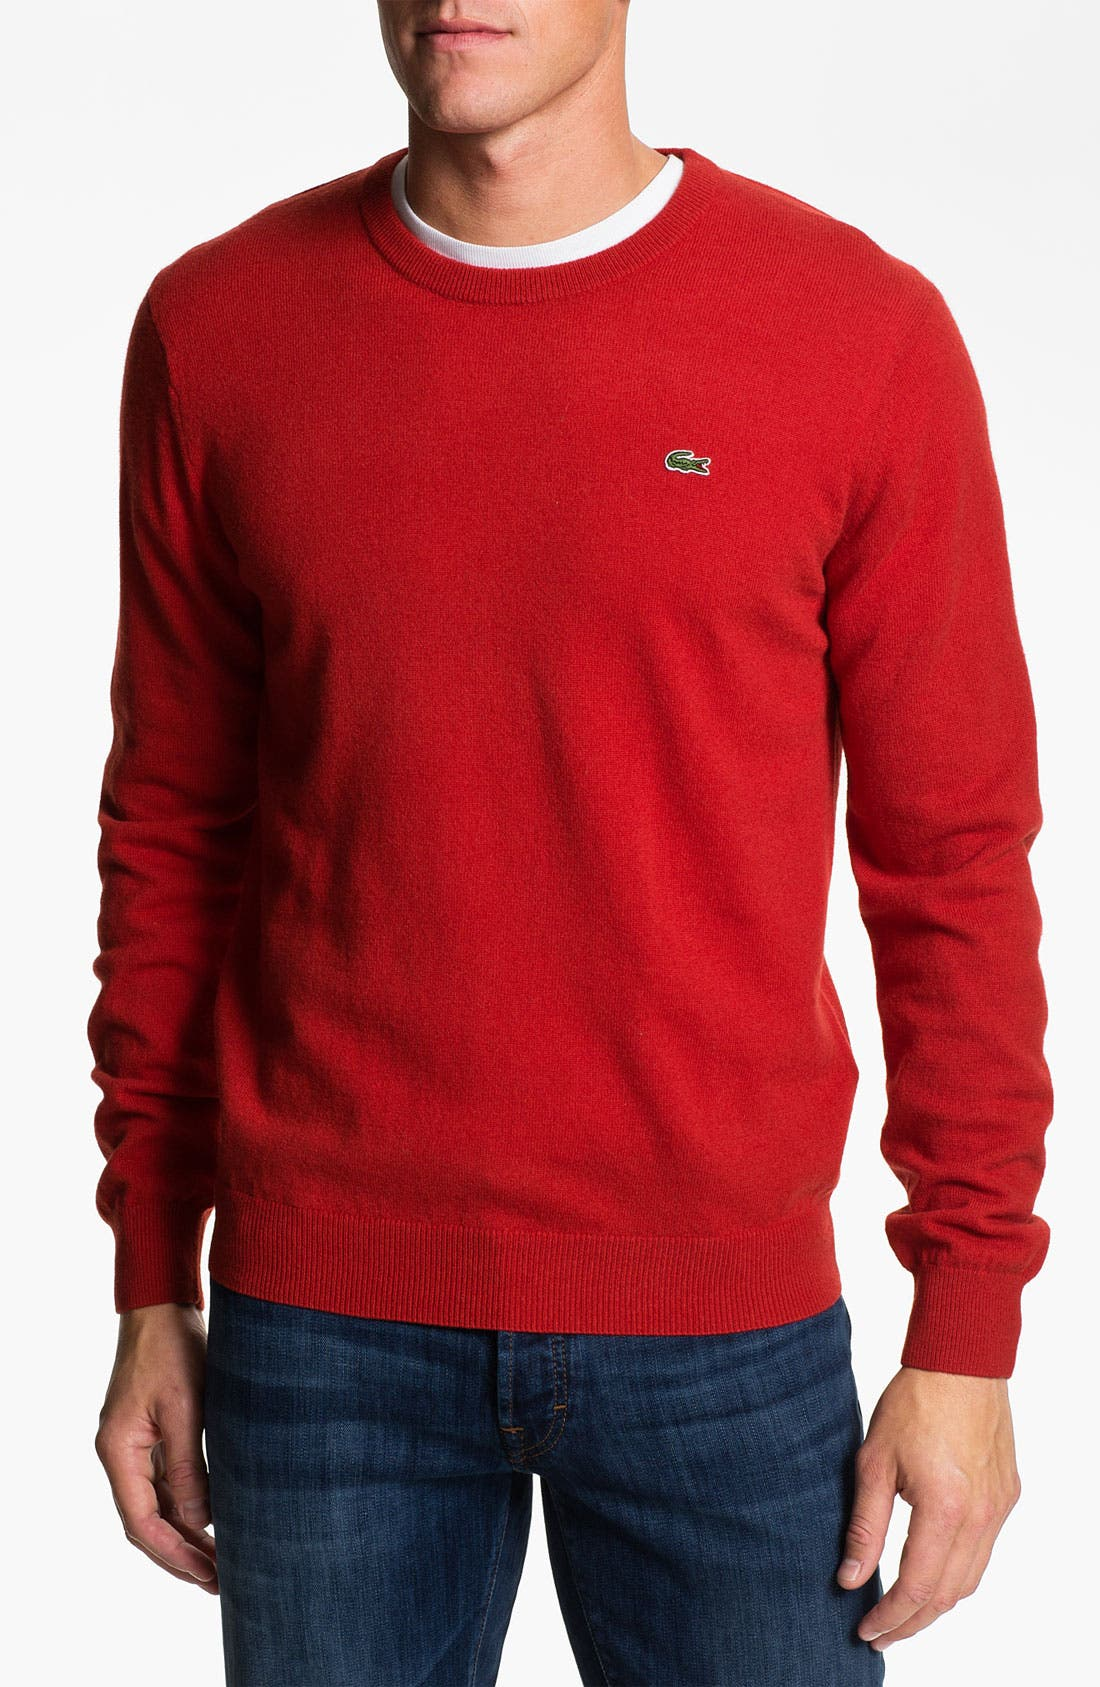 Alternate Image 1 Selected - Lacoste Crewneck Wool Sweater